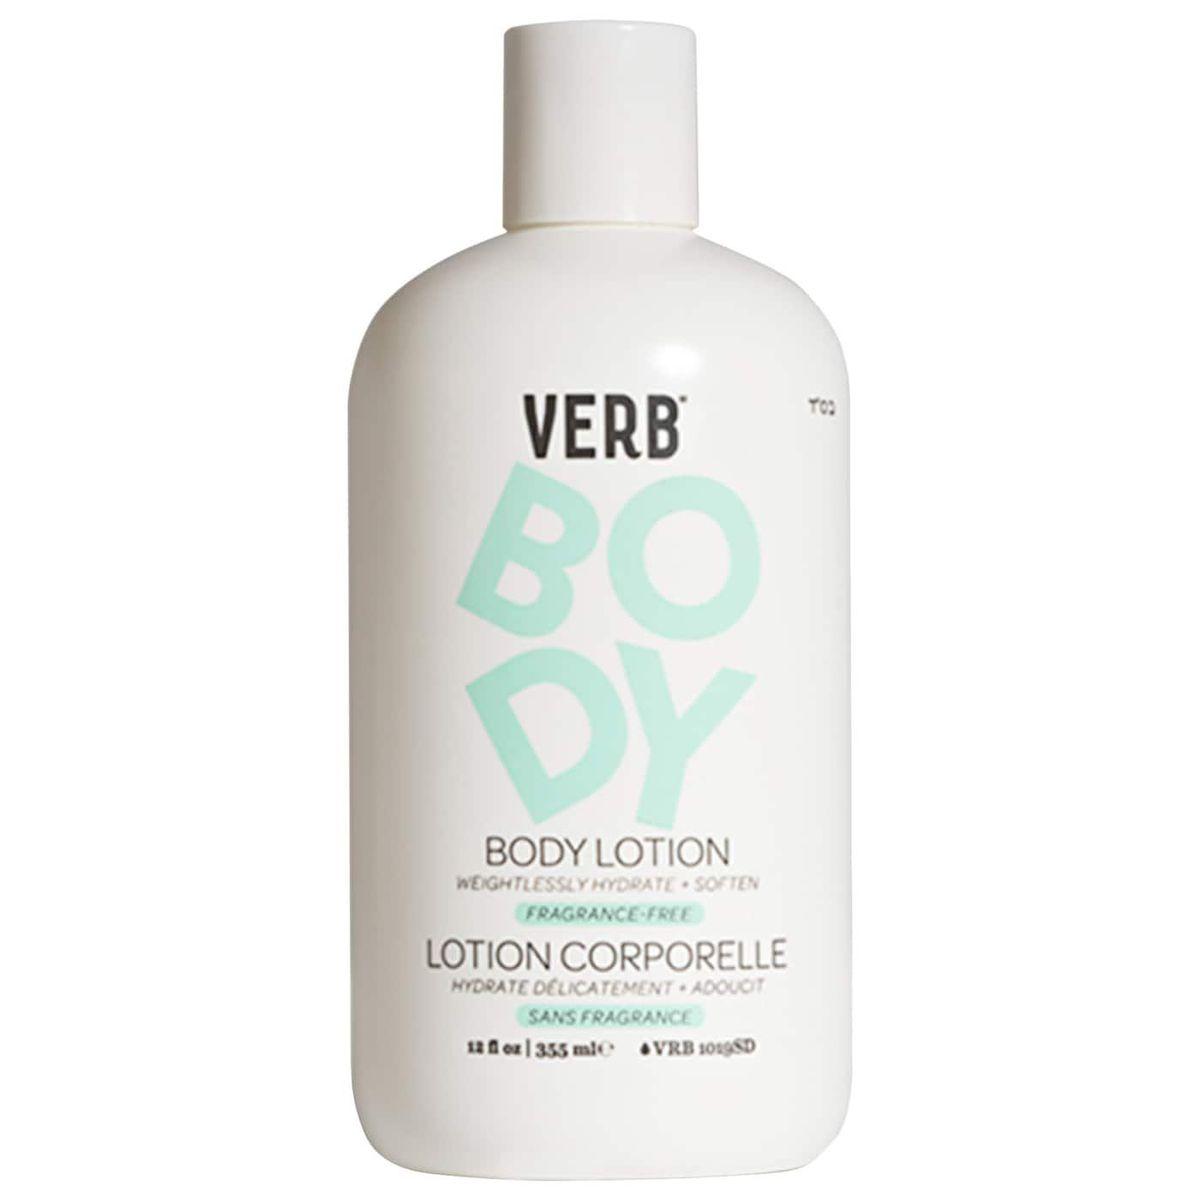 verb body lotion